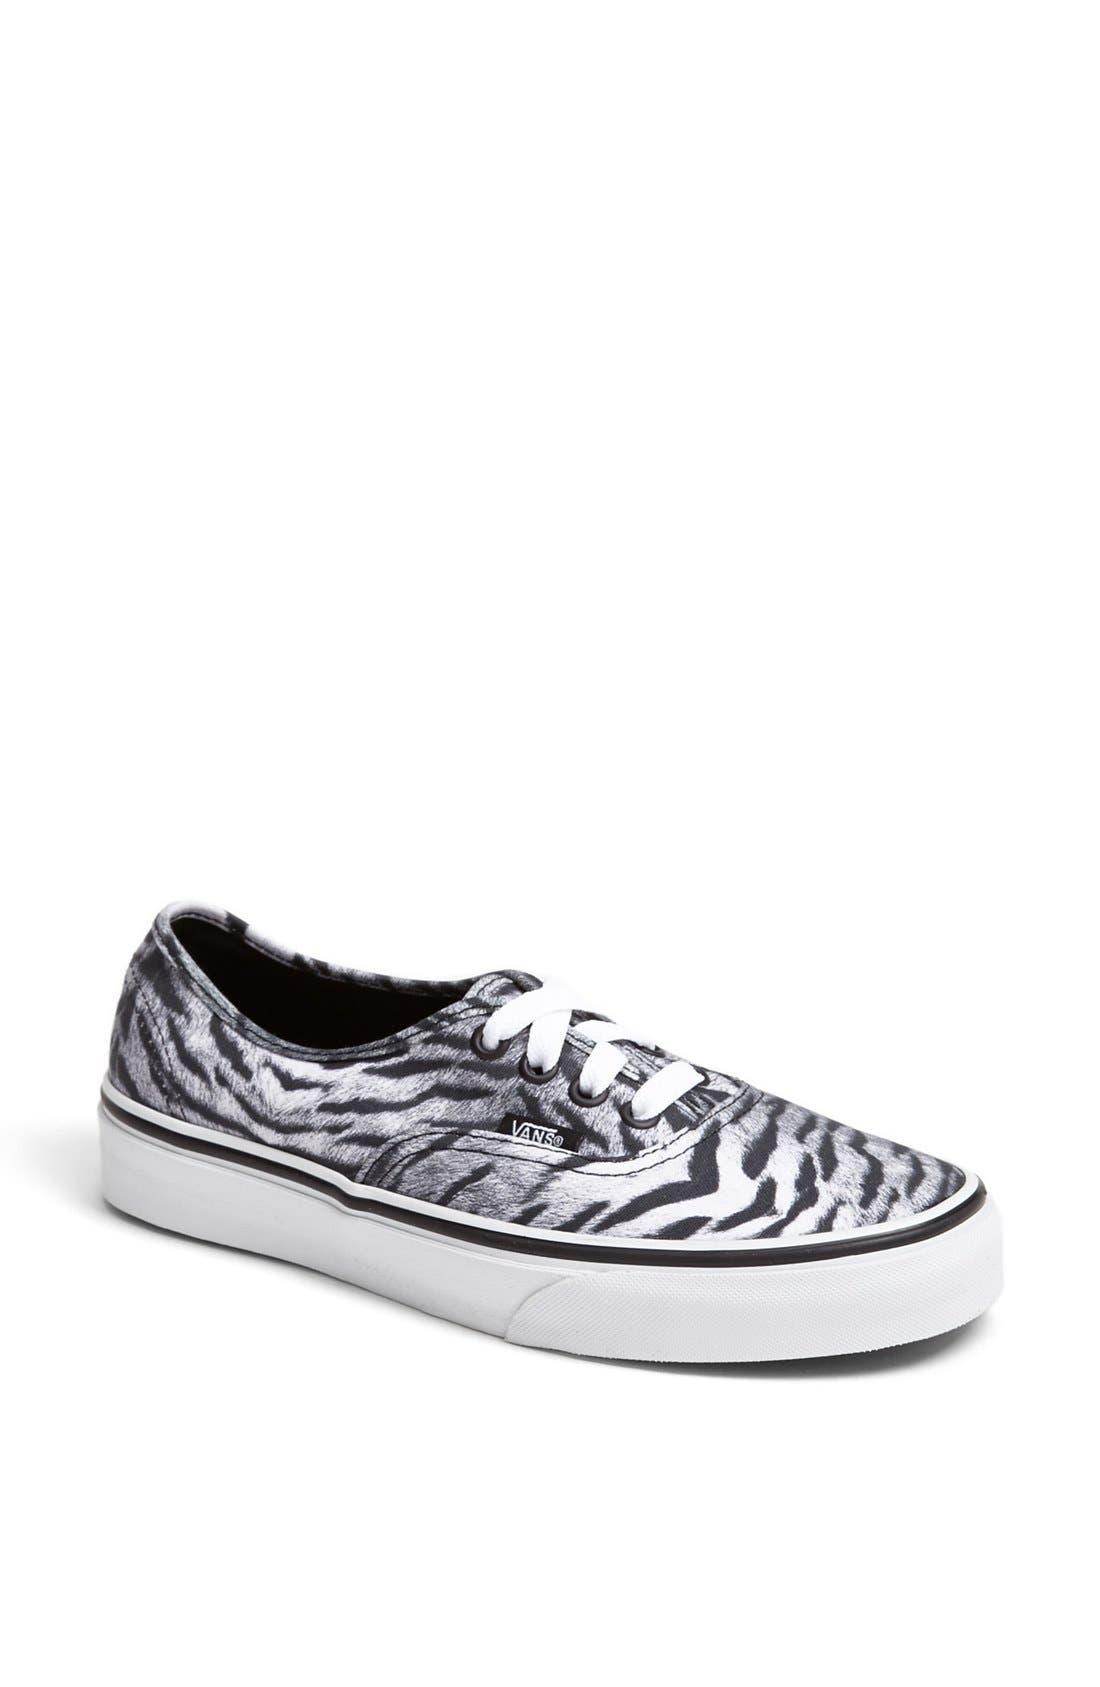 Alternate Image 1 Selected - Vans 'Authentic' Sneaker (Women)